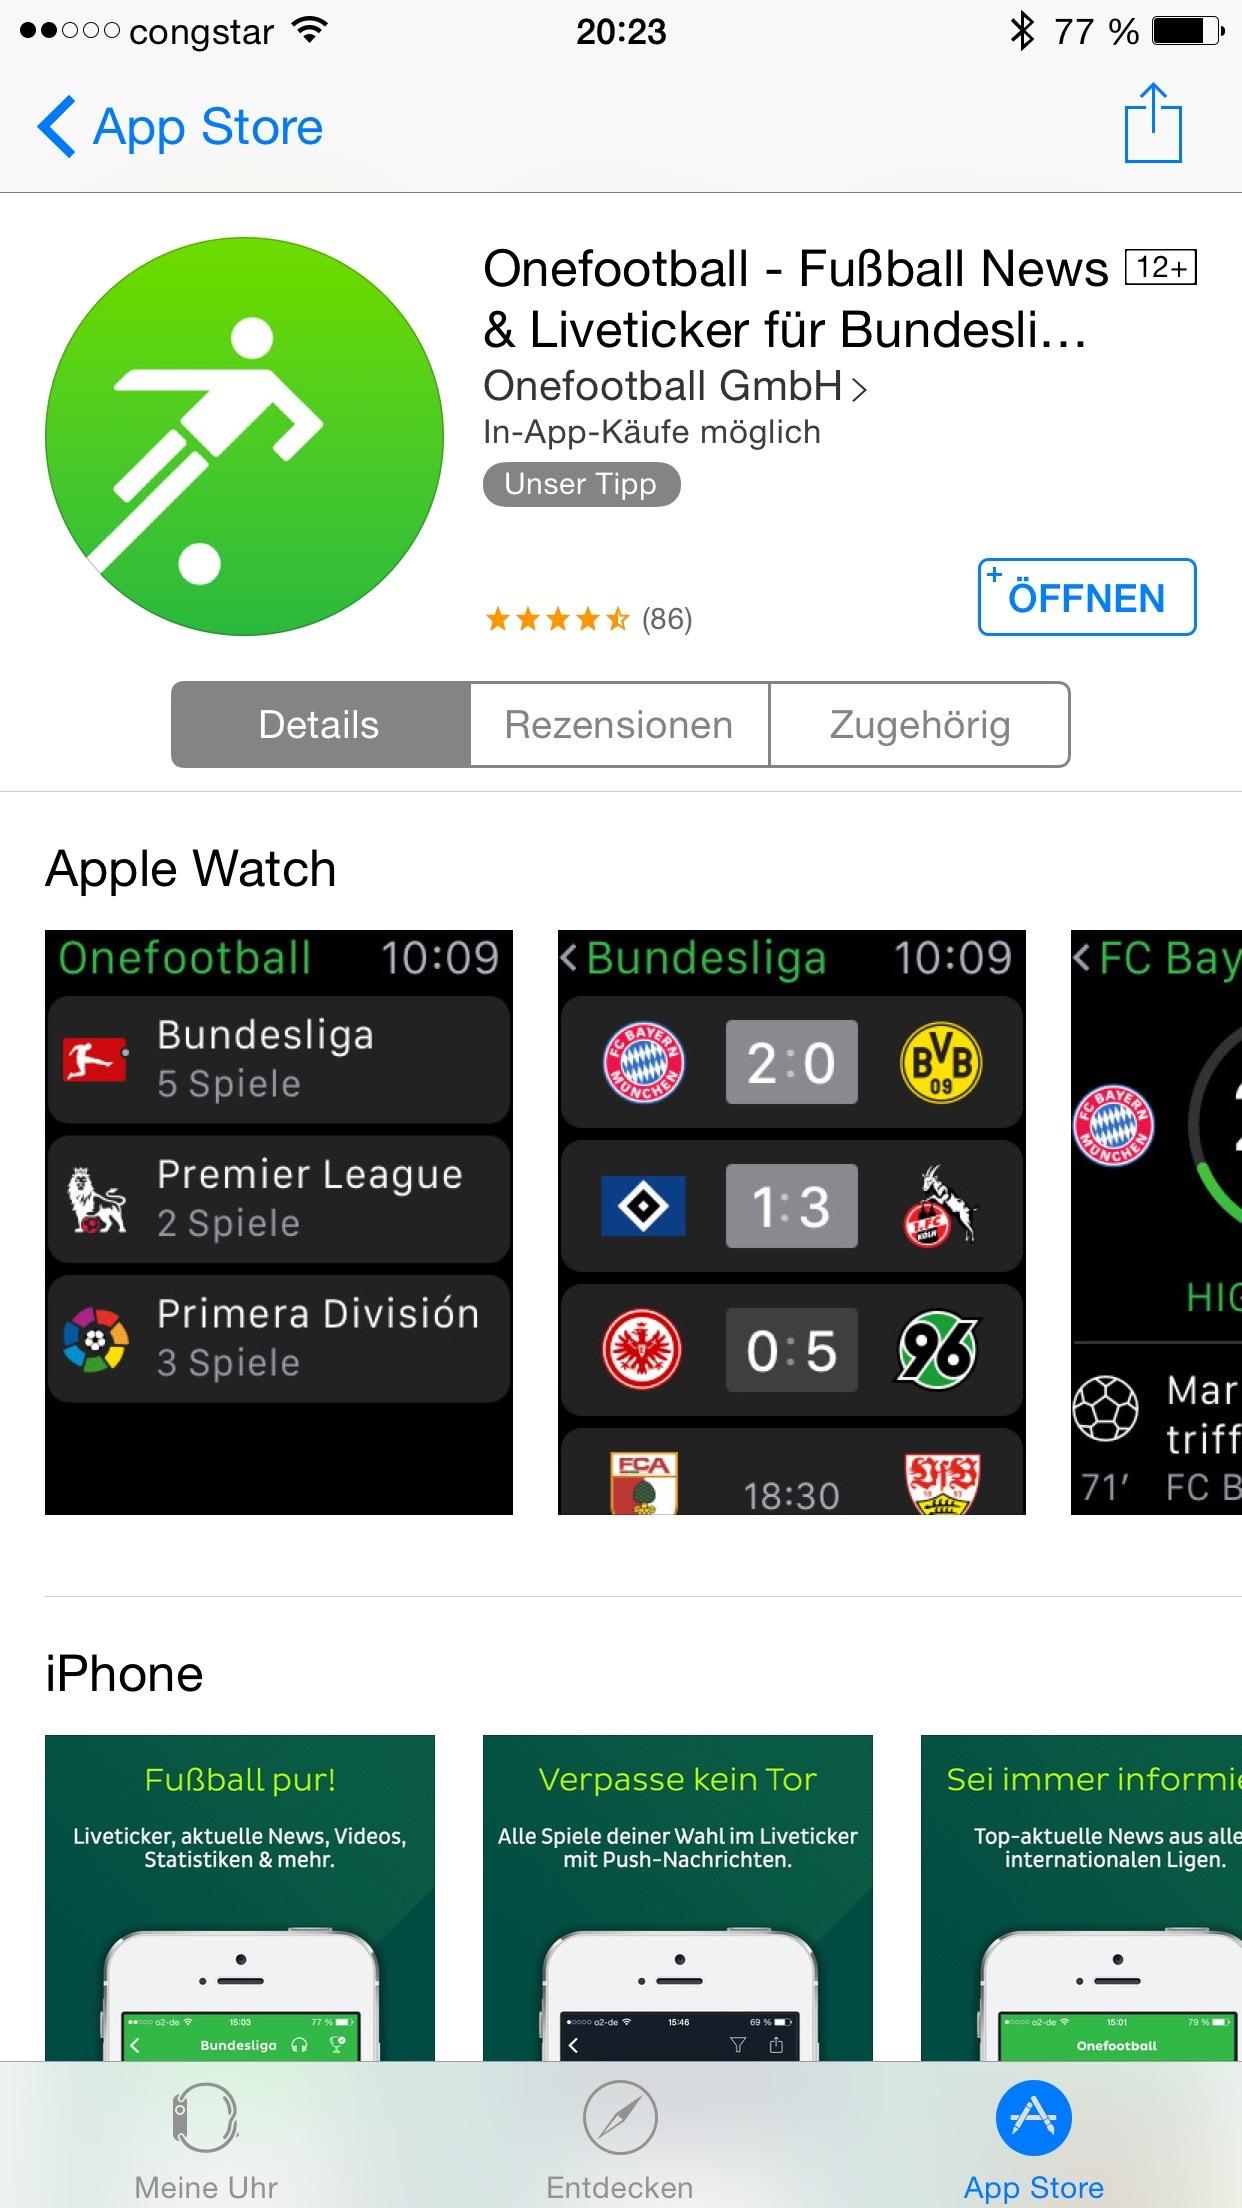 Apple Watch App Store Geht Heute Online